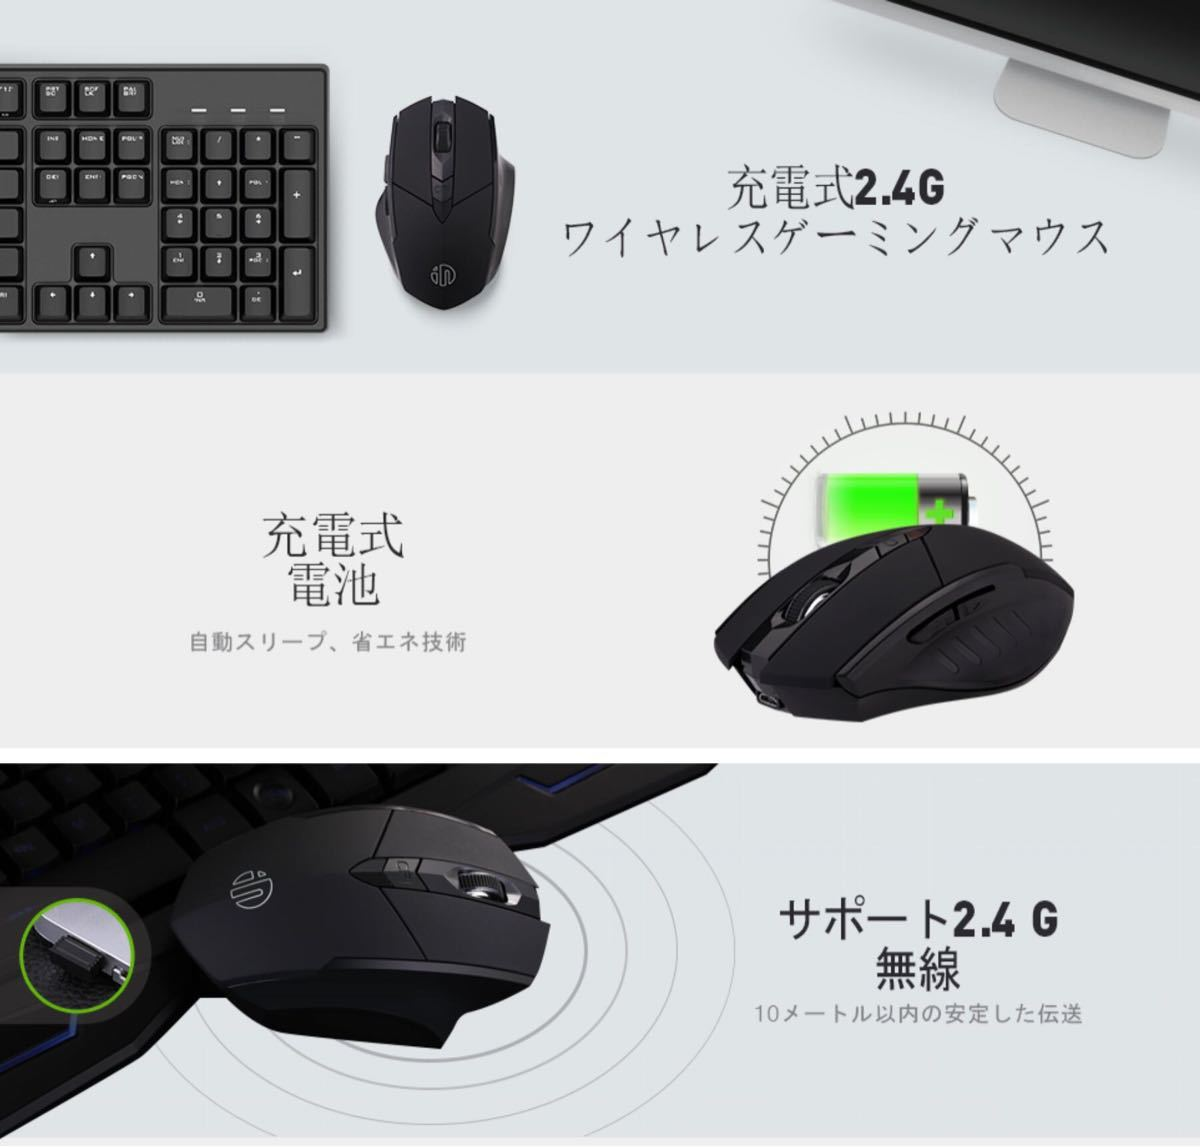 inphic ワイヤレスマウス 光学式 無線 6ボタン マウス Bluetooth グレー